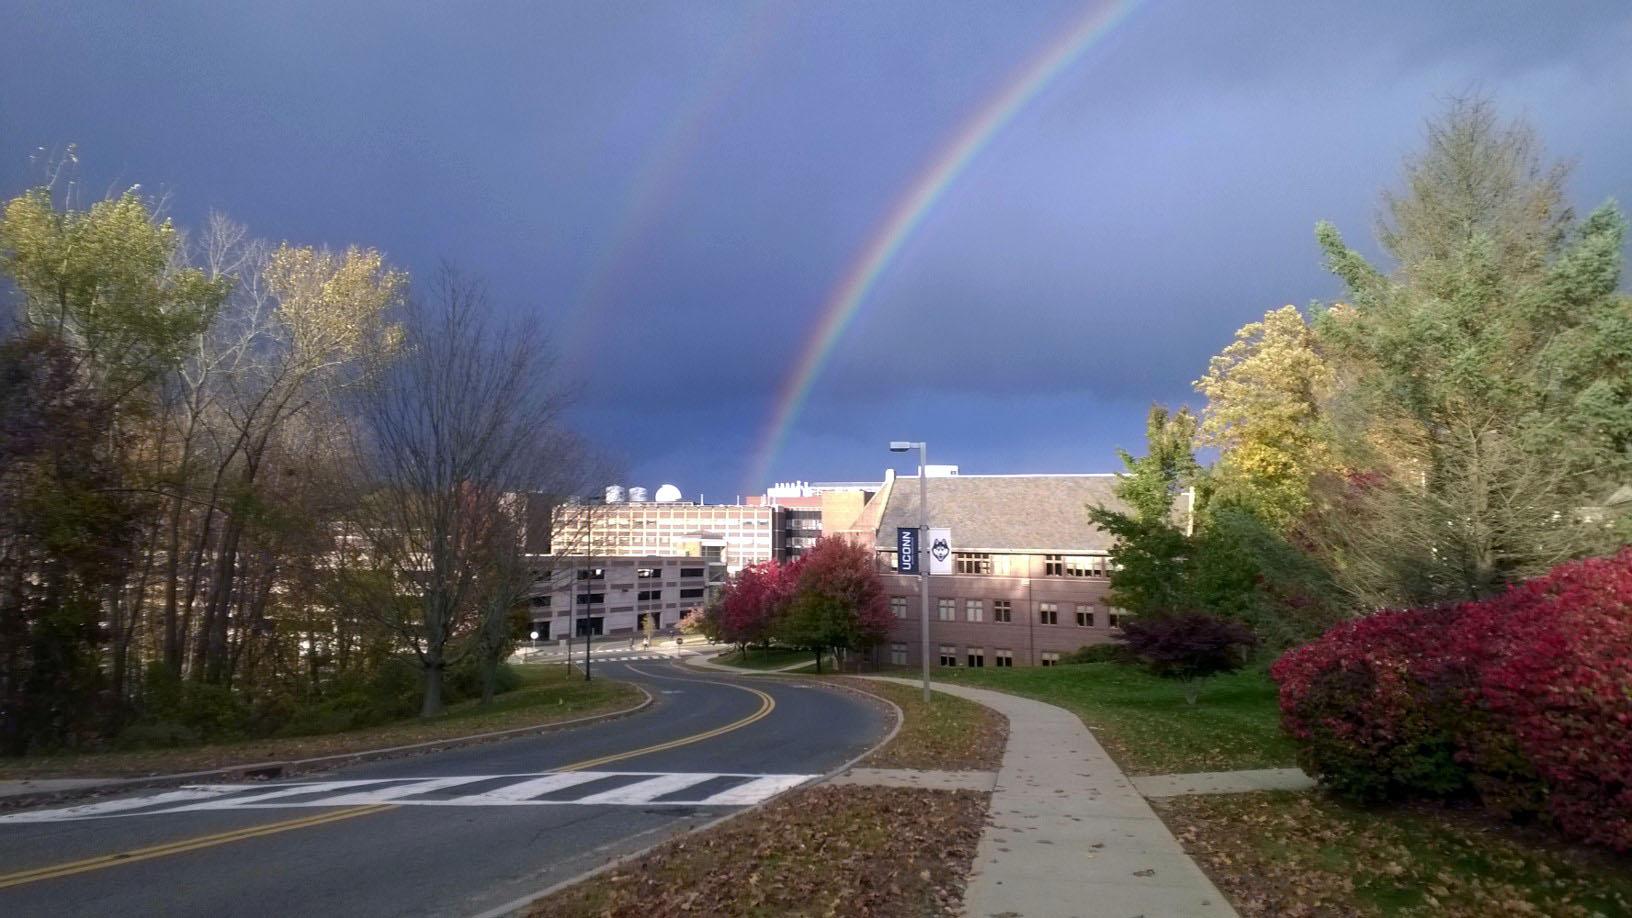 Uconn, Storrs campus